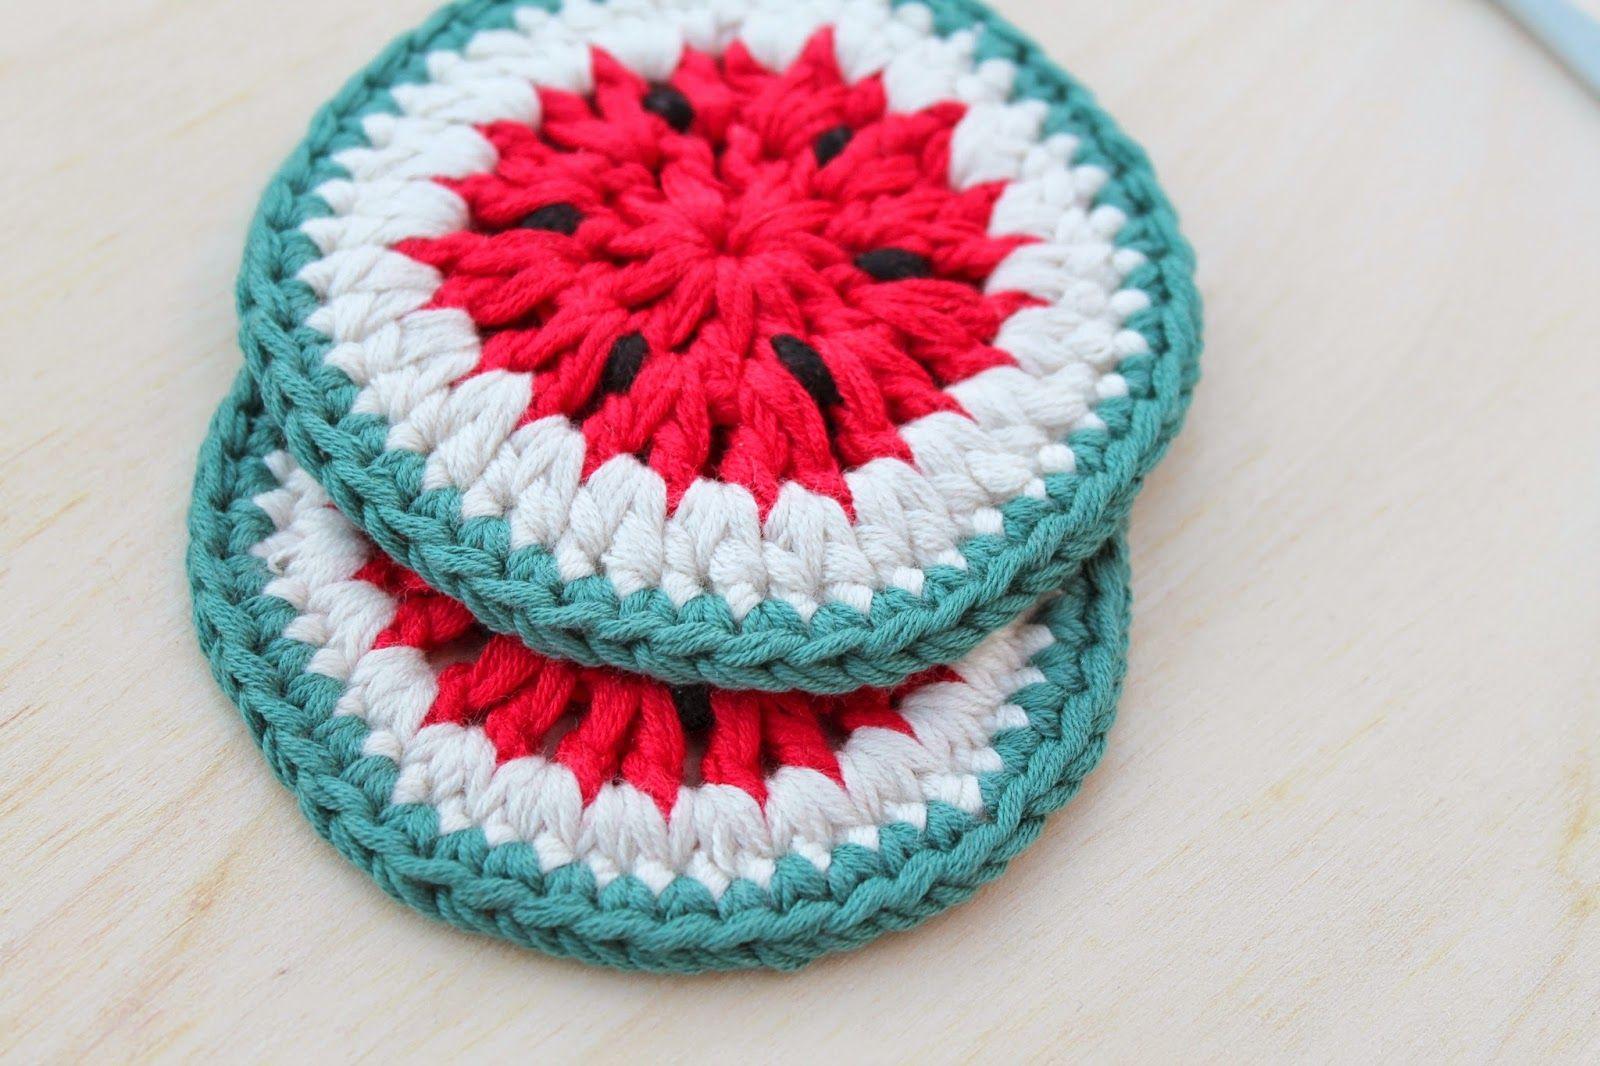 matemo: Mis DIY favoritos / My favorite DIYs # 15 - Crochet Watermelon Coasters